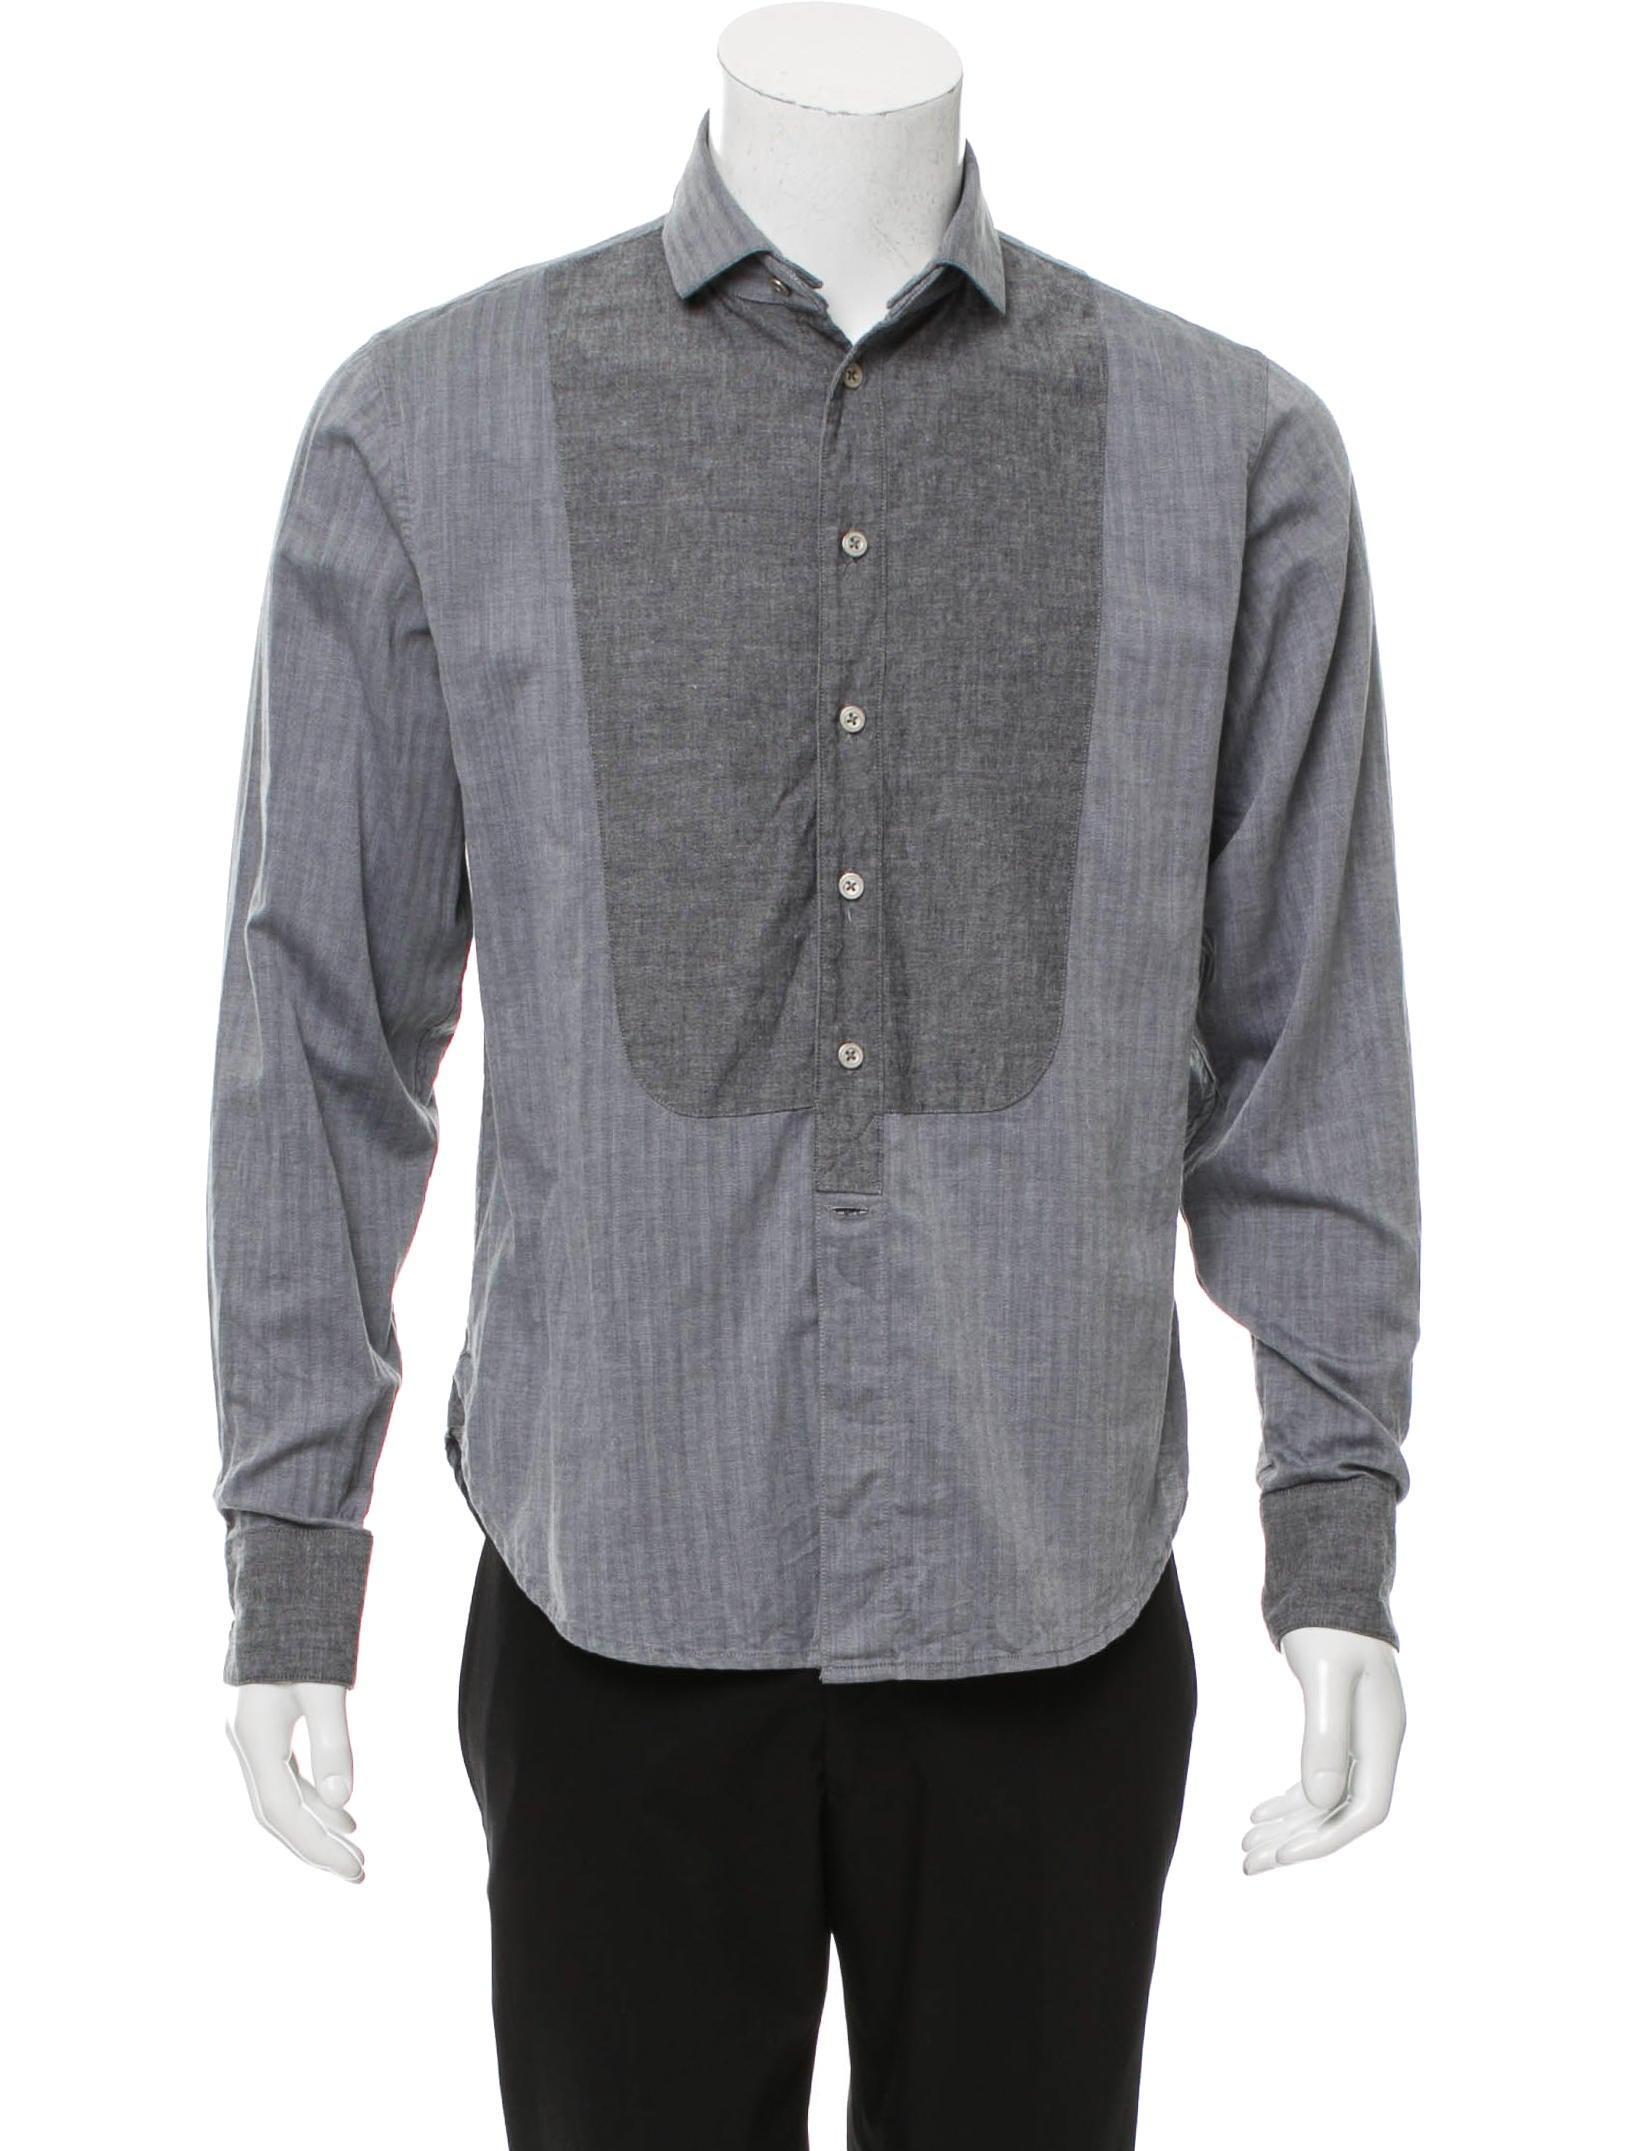 Rag bone tuxedo button up shirt clothing wragb69048 for Rag and bone mens shirts sale